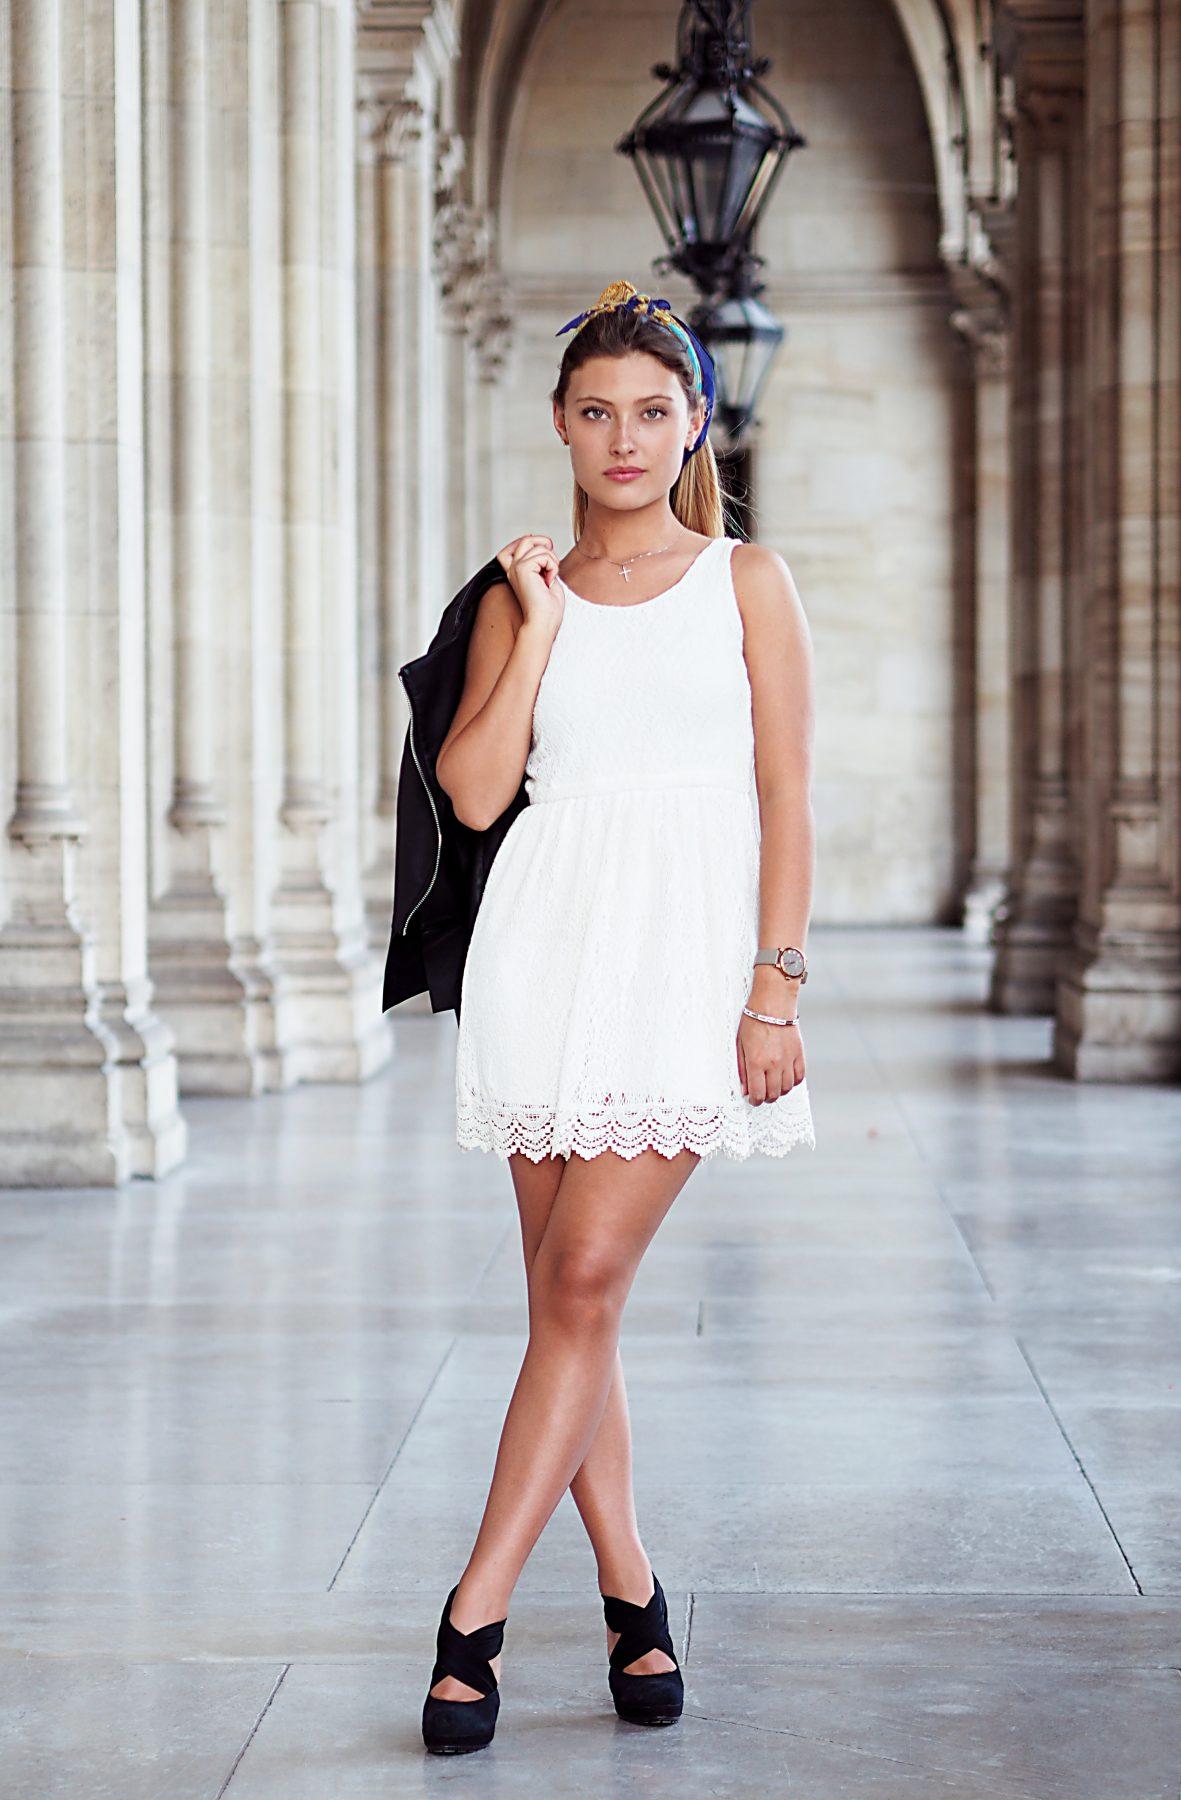 virag-fashion-photographer-vienna-austria-taylor-content.jpg